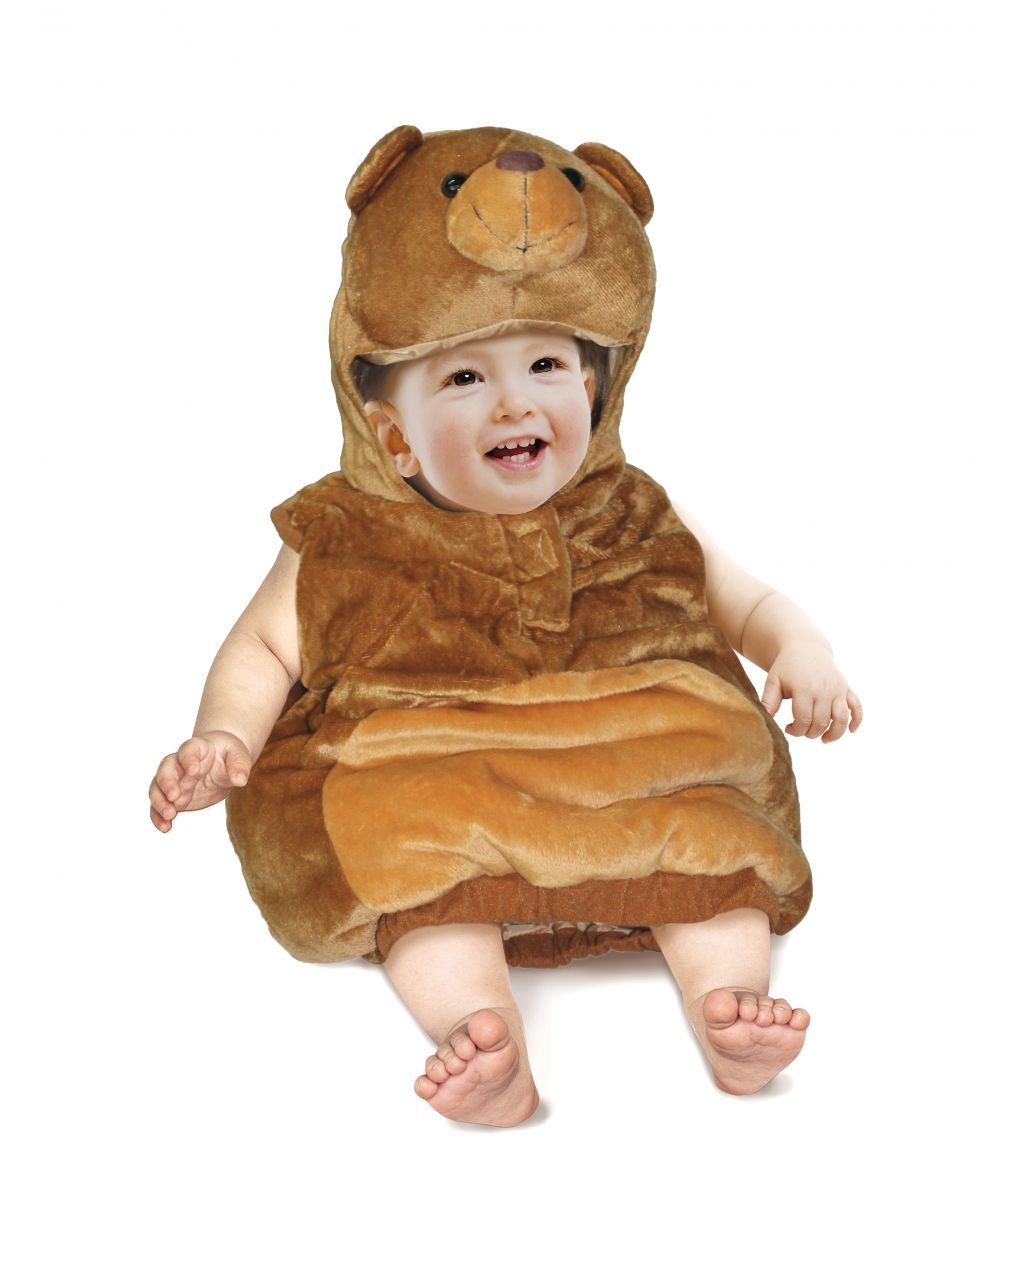 Costume orsetto baby 12 mesi - Carnaval Queen